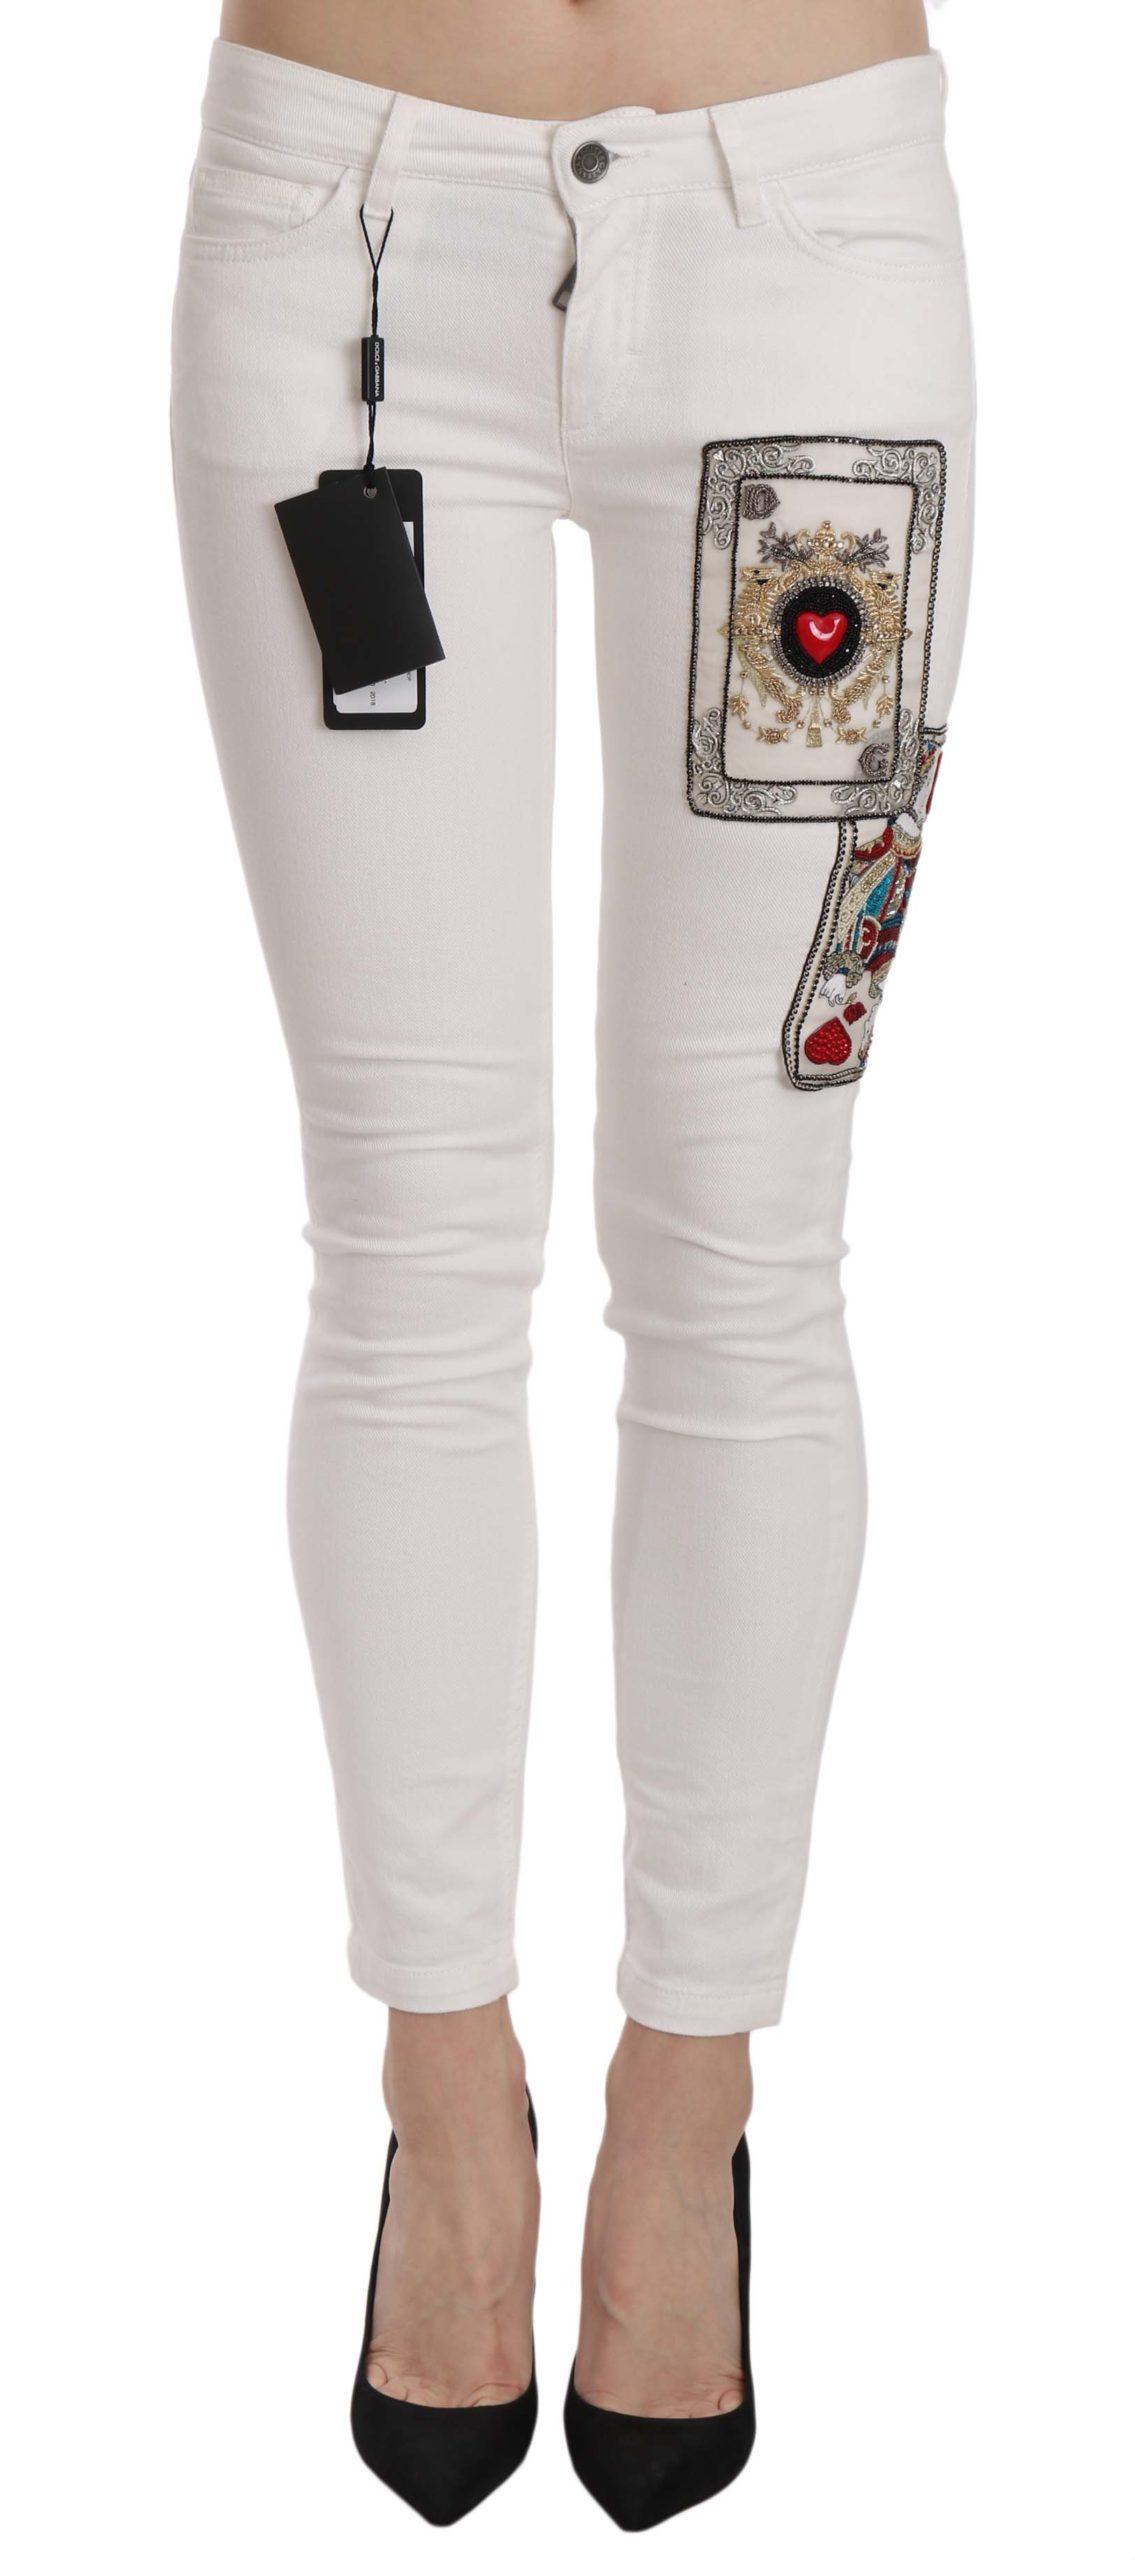 Dolce & Gabbana Women's Of Hearts Crystal Skinny Jeans White PAN61198 - IT38 XS